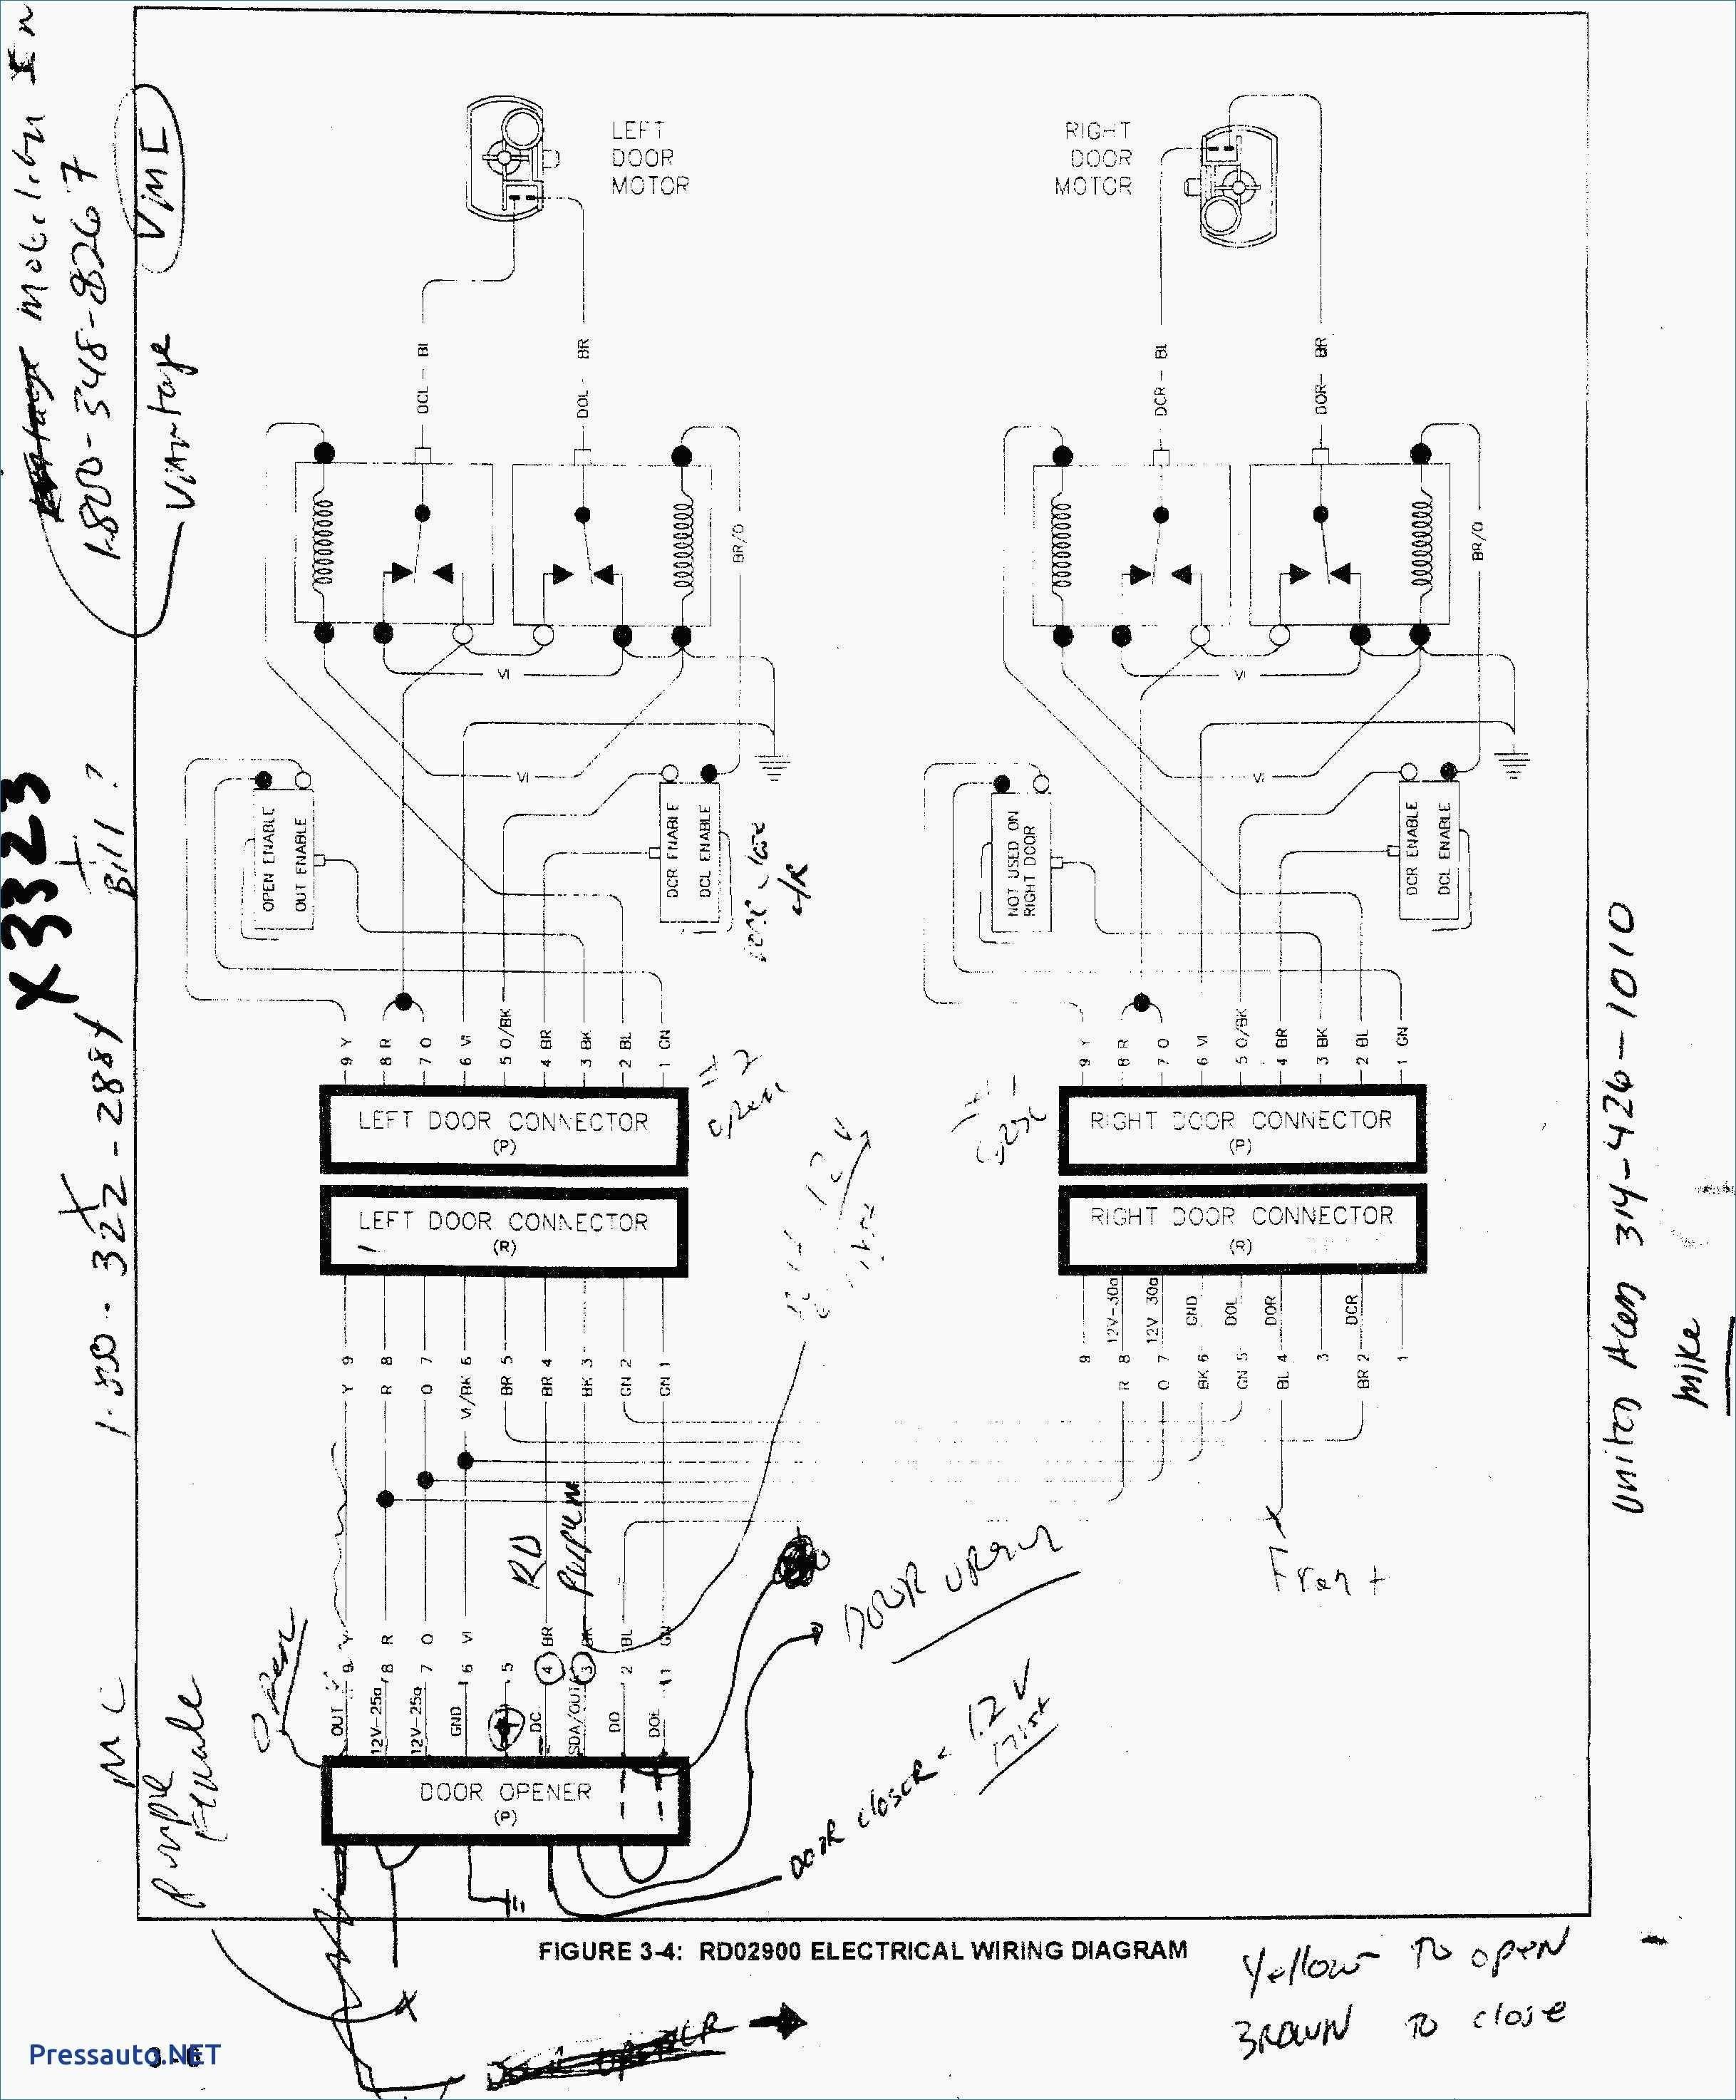 48v Golf Cart Wiring Diagram in 2020 Unique cars